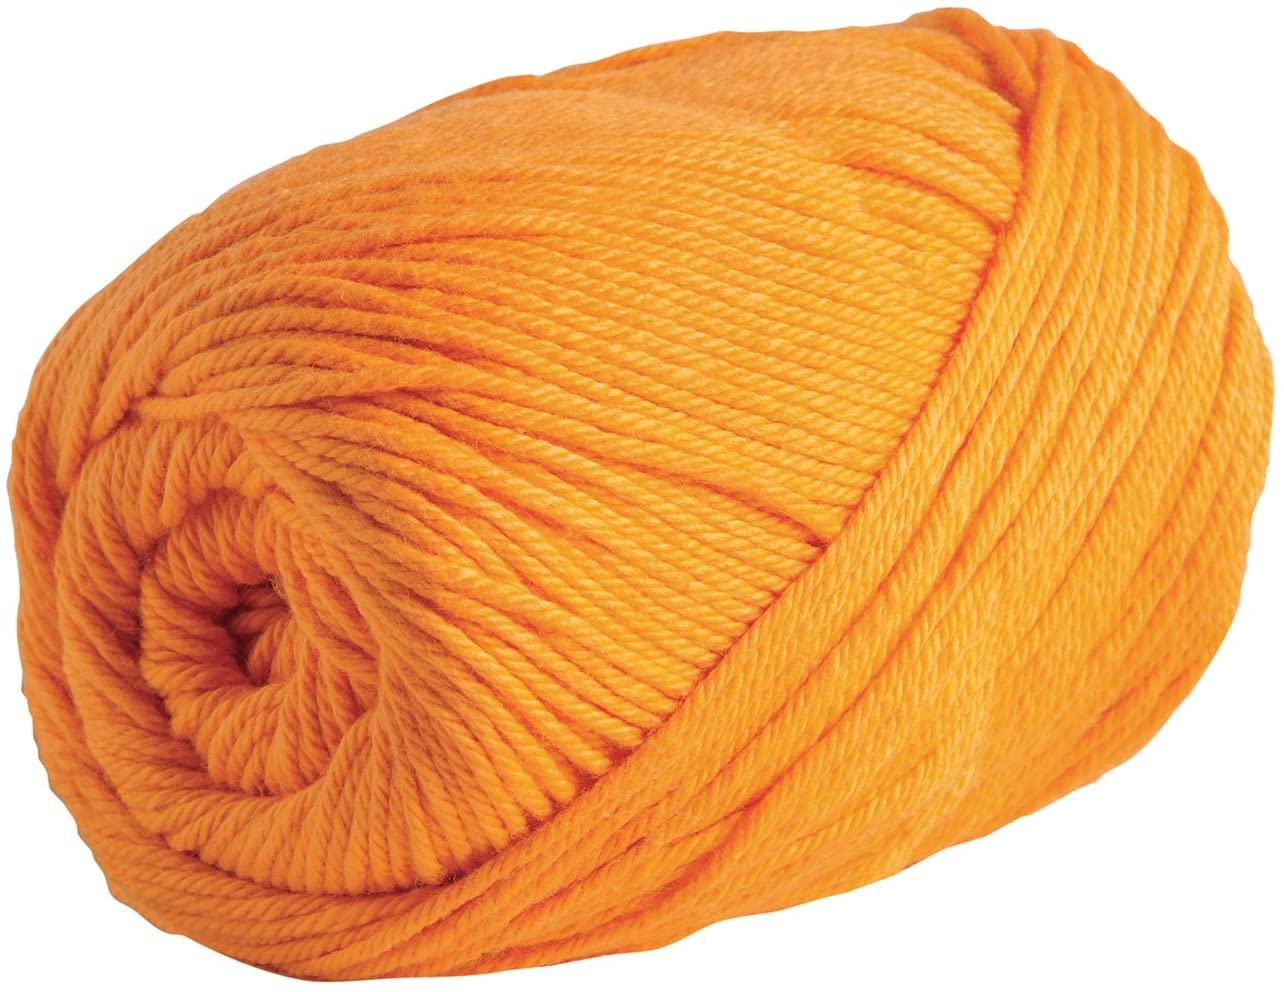 Knit Picks Dishie Worsted Weight 100% Cotton Yarn - 100 g (Fox)